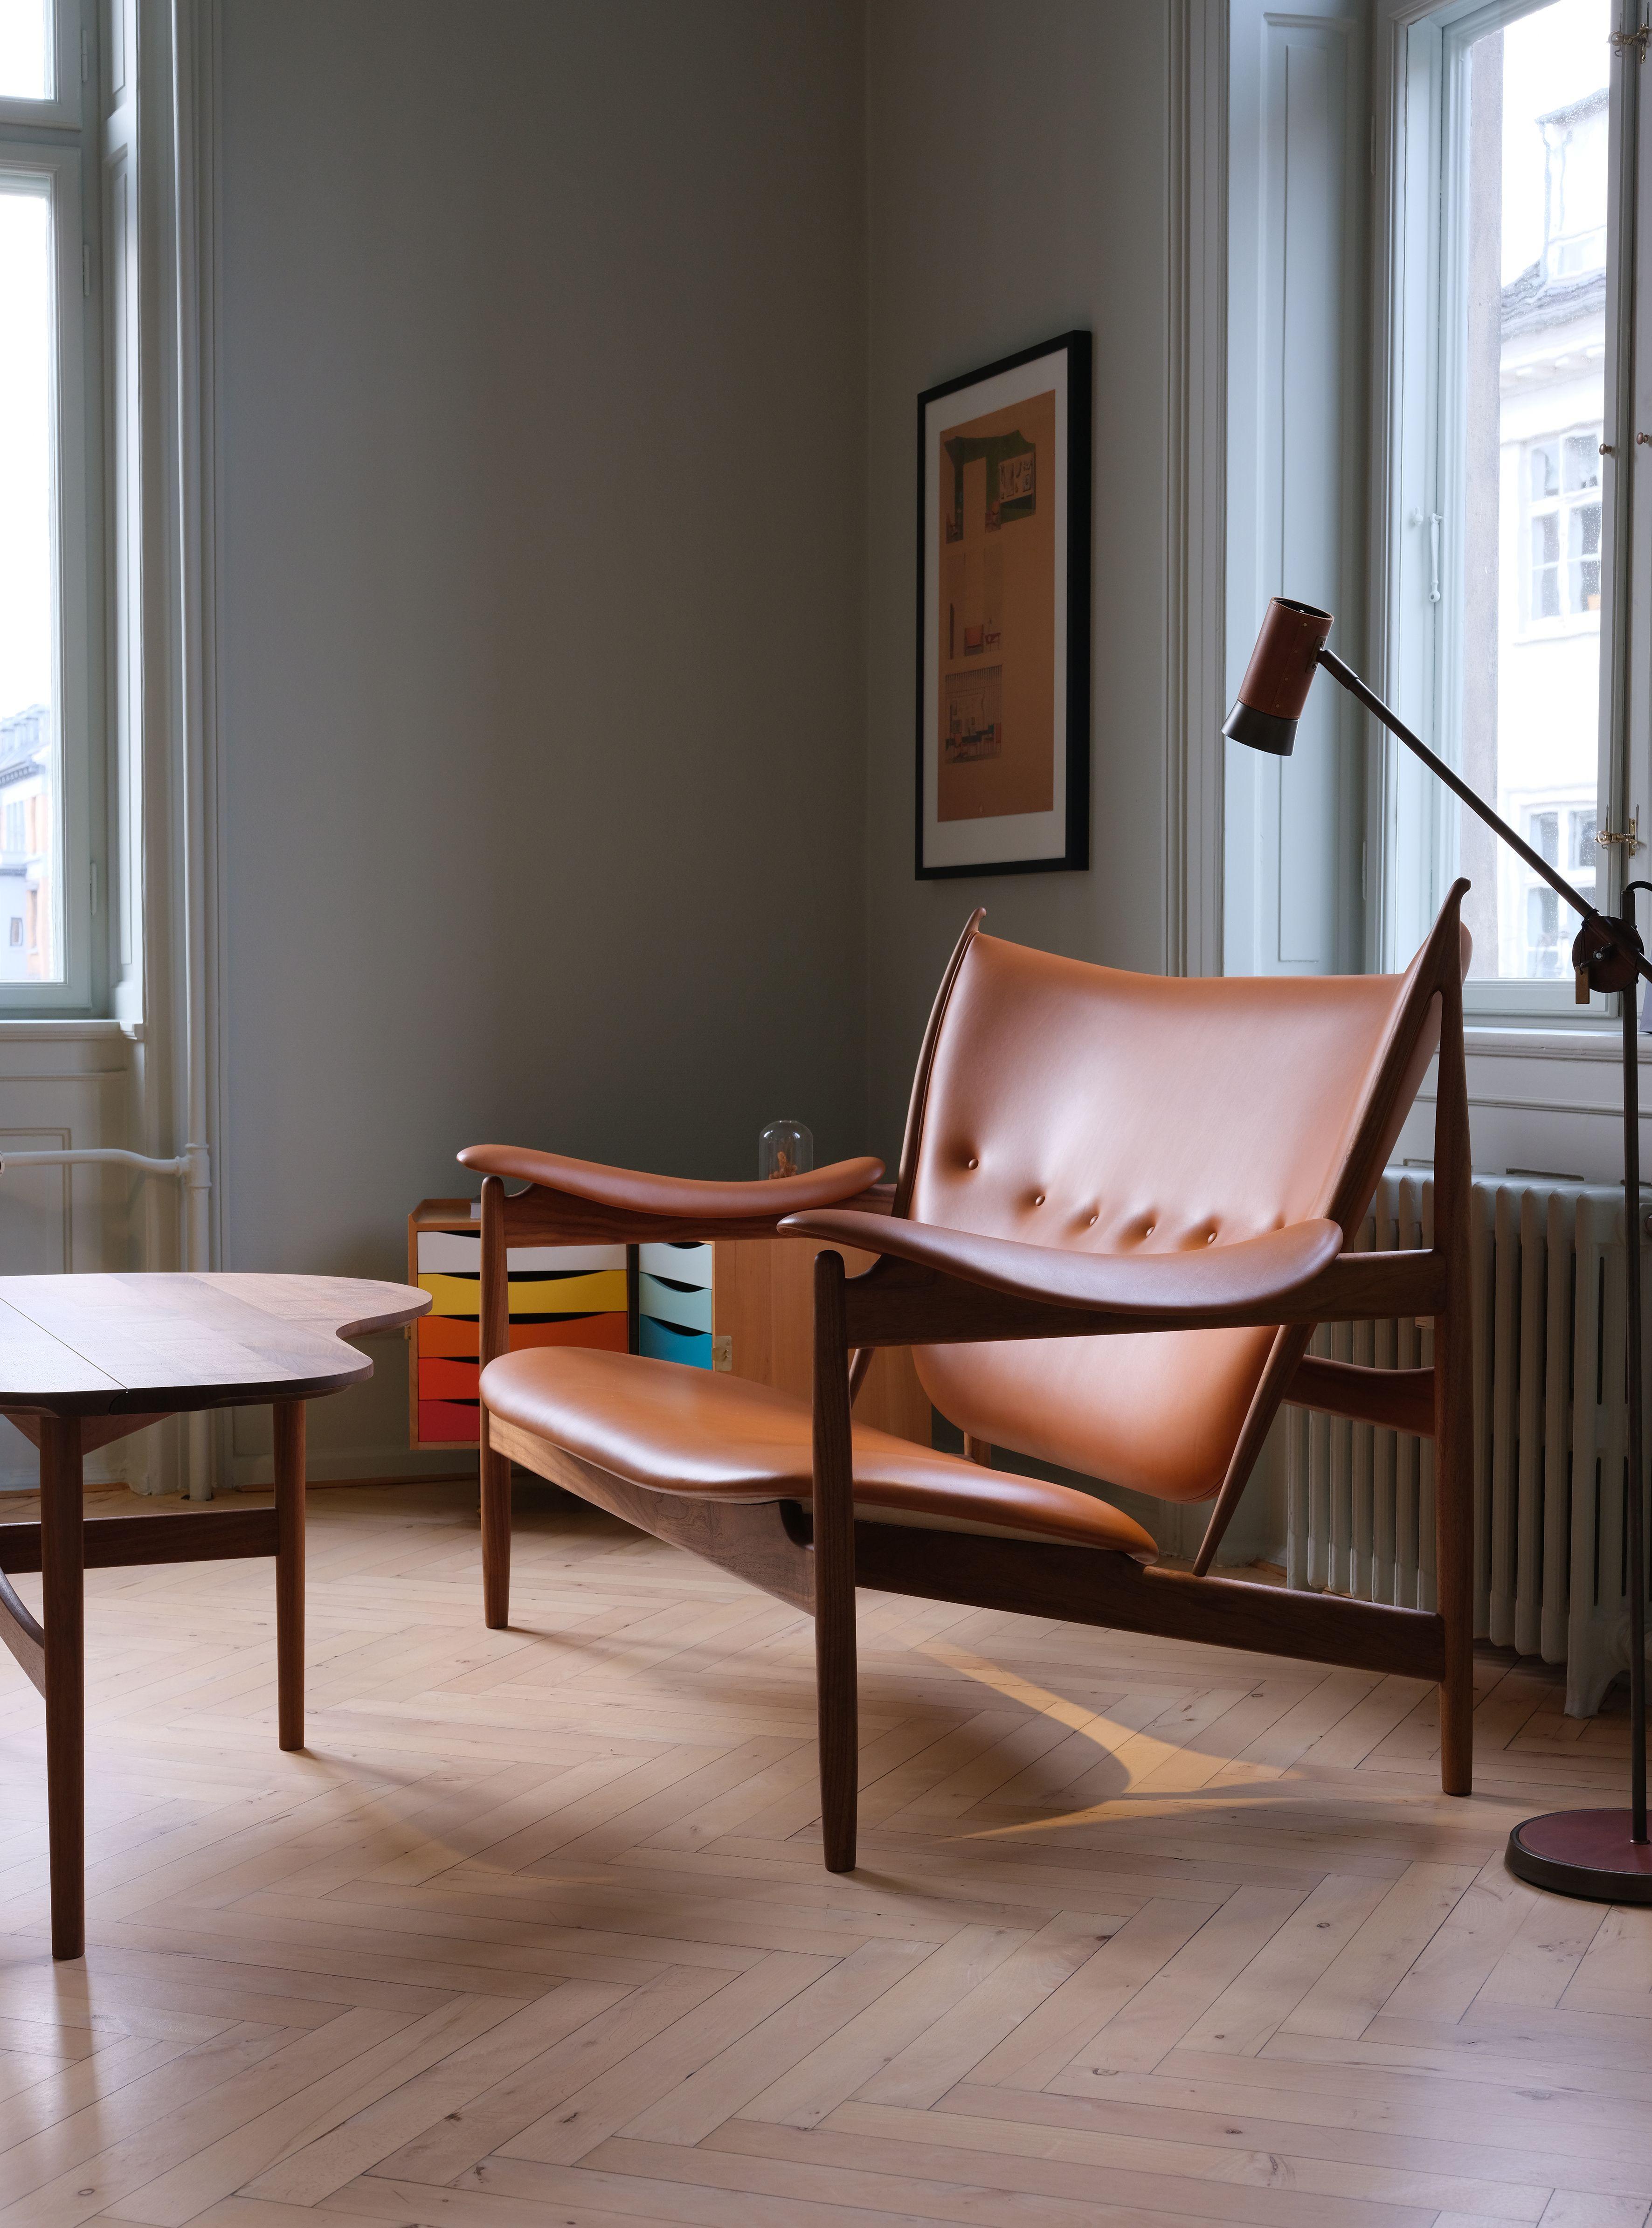 House Of Finn Juhl Finn Juhl Furniture Danish Design Craftsmanship Interior Scandinavian Ico In 2020 Danish Interior Design Home Decor Furniture Design